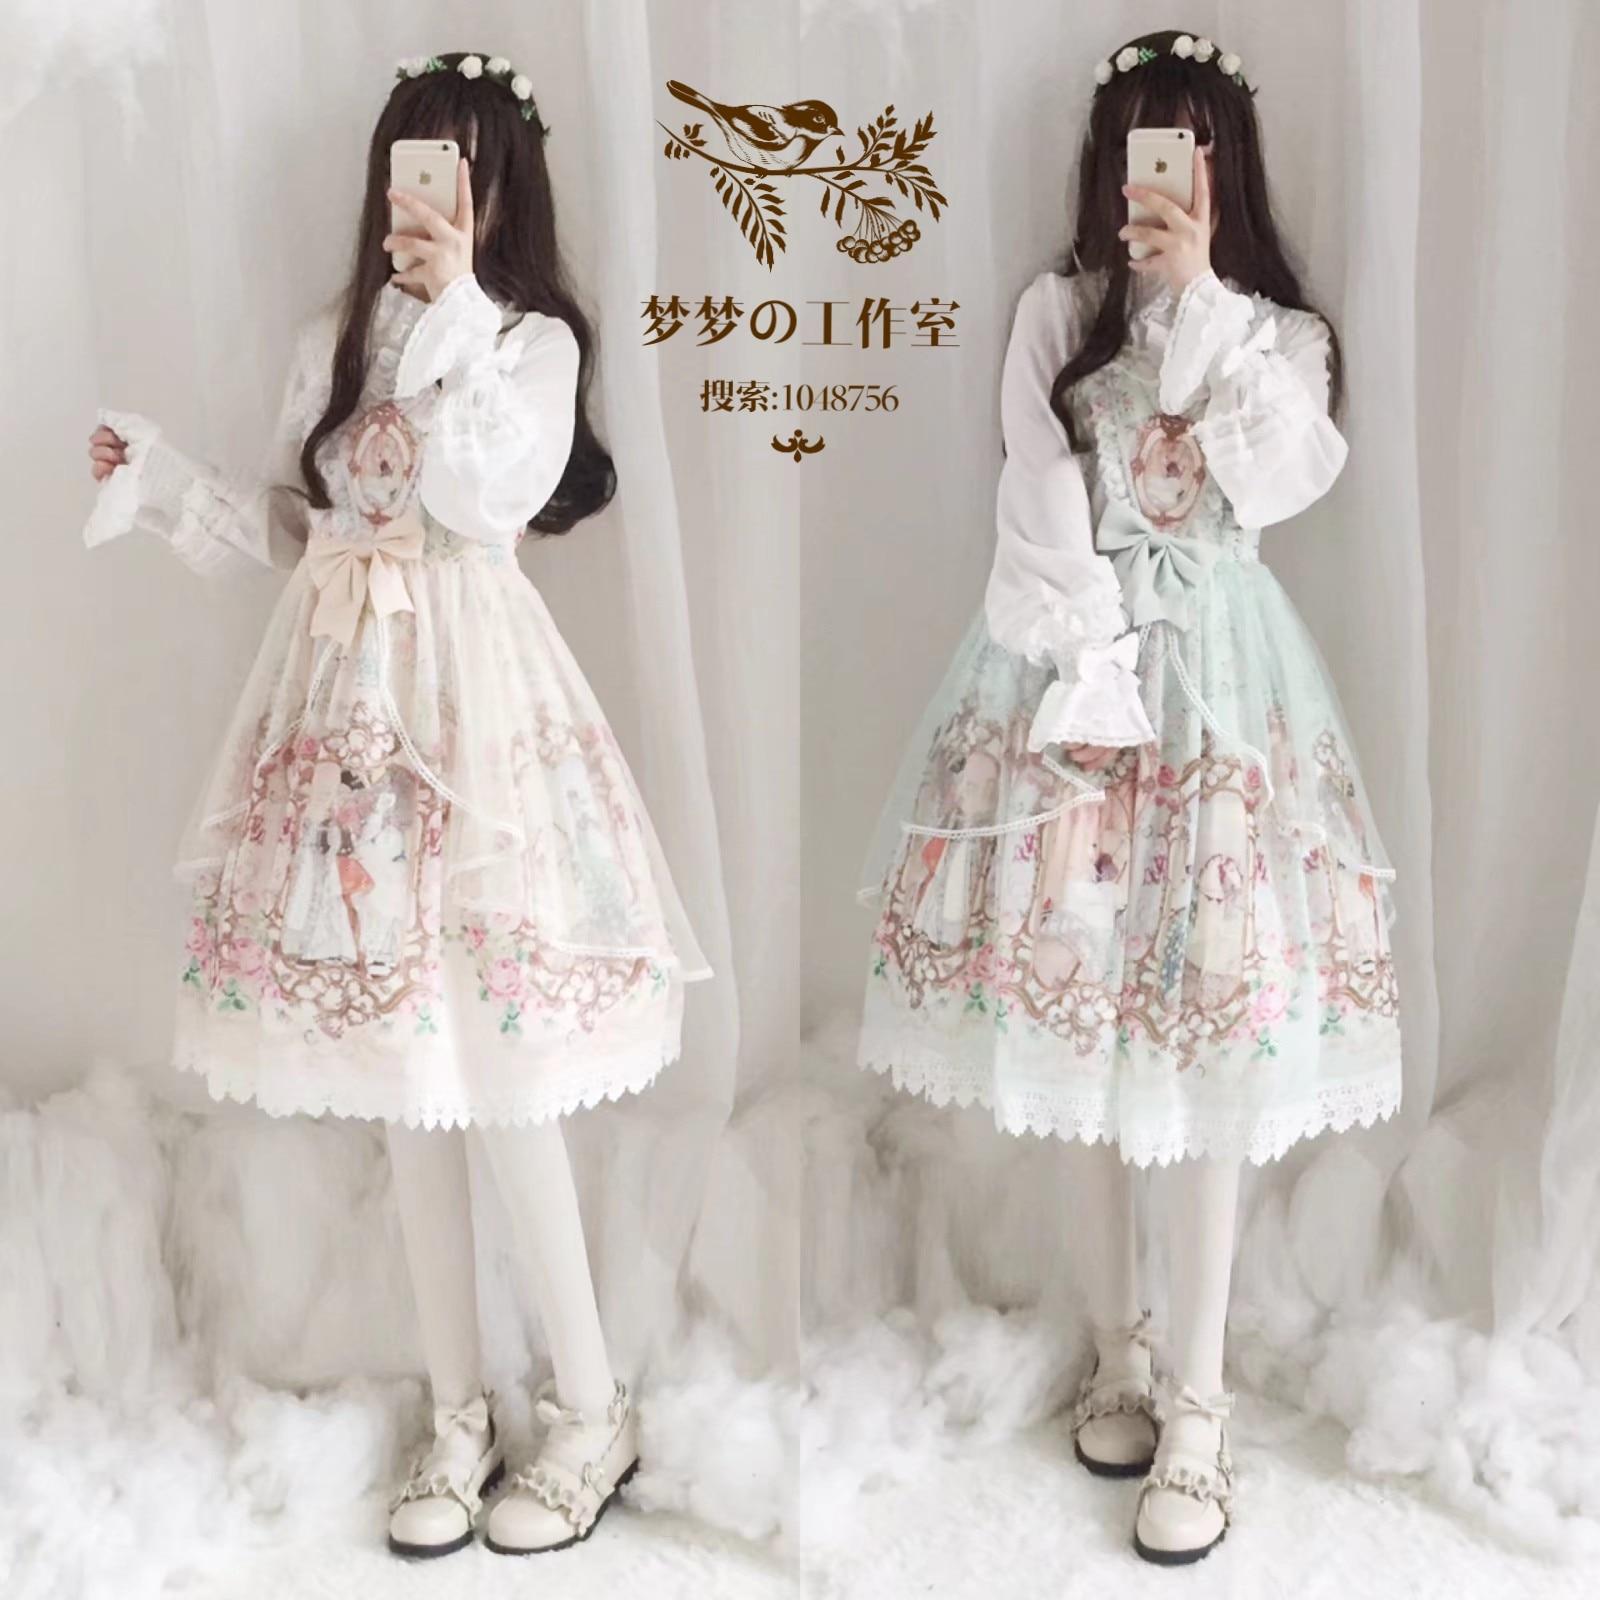 US $106.9 |Zanzea Sale Plus Size Free Shipping 2019 New Brocade Garden  National Brand Original Lolita Dress Girl Daily Princess Hanging-in Dresses  ...